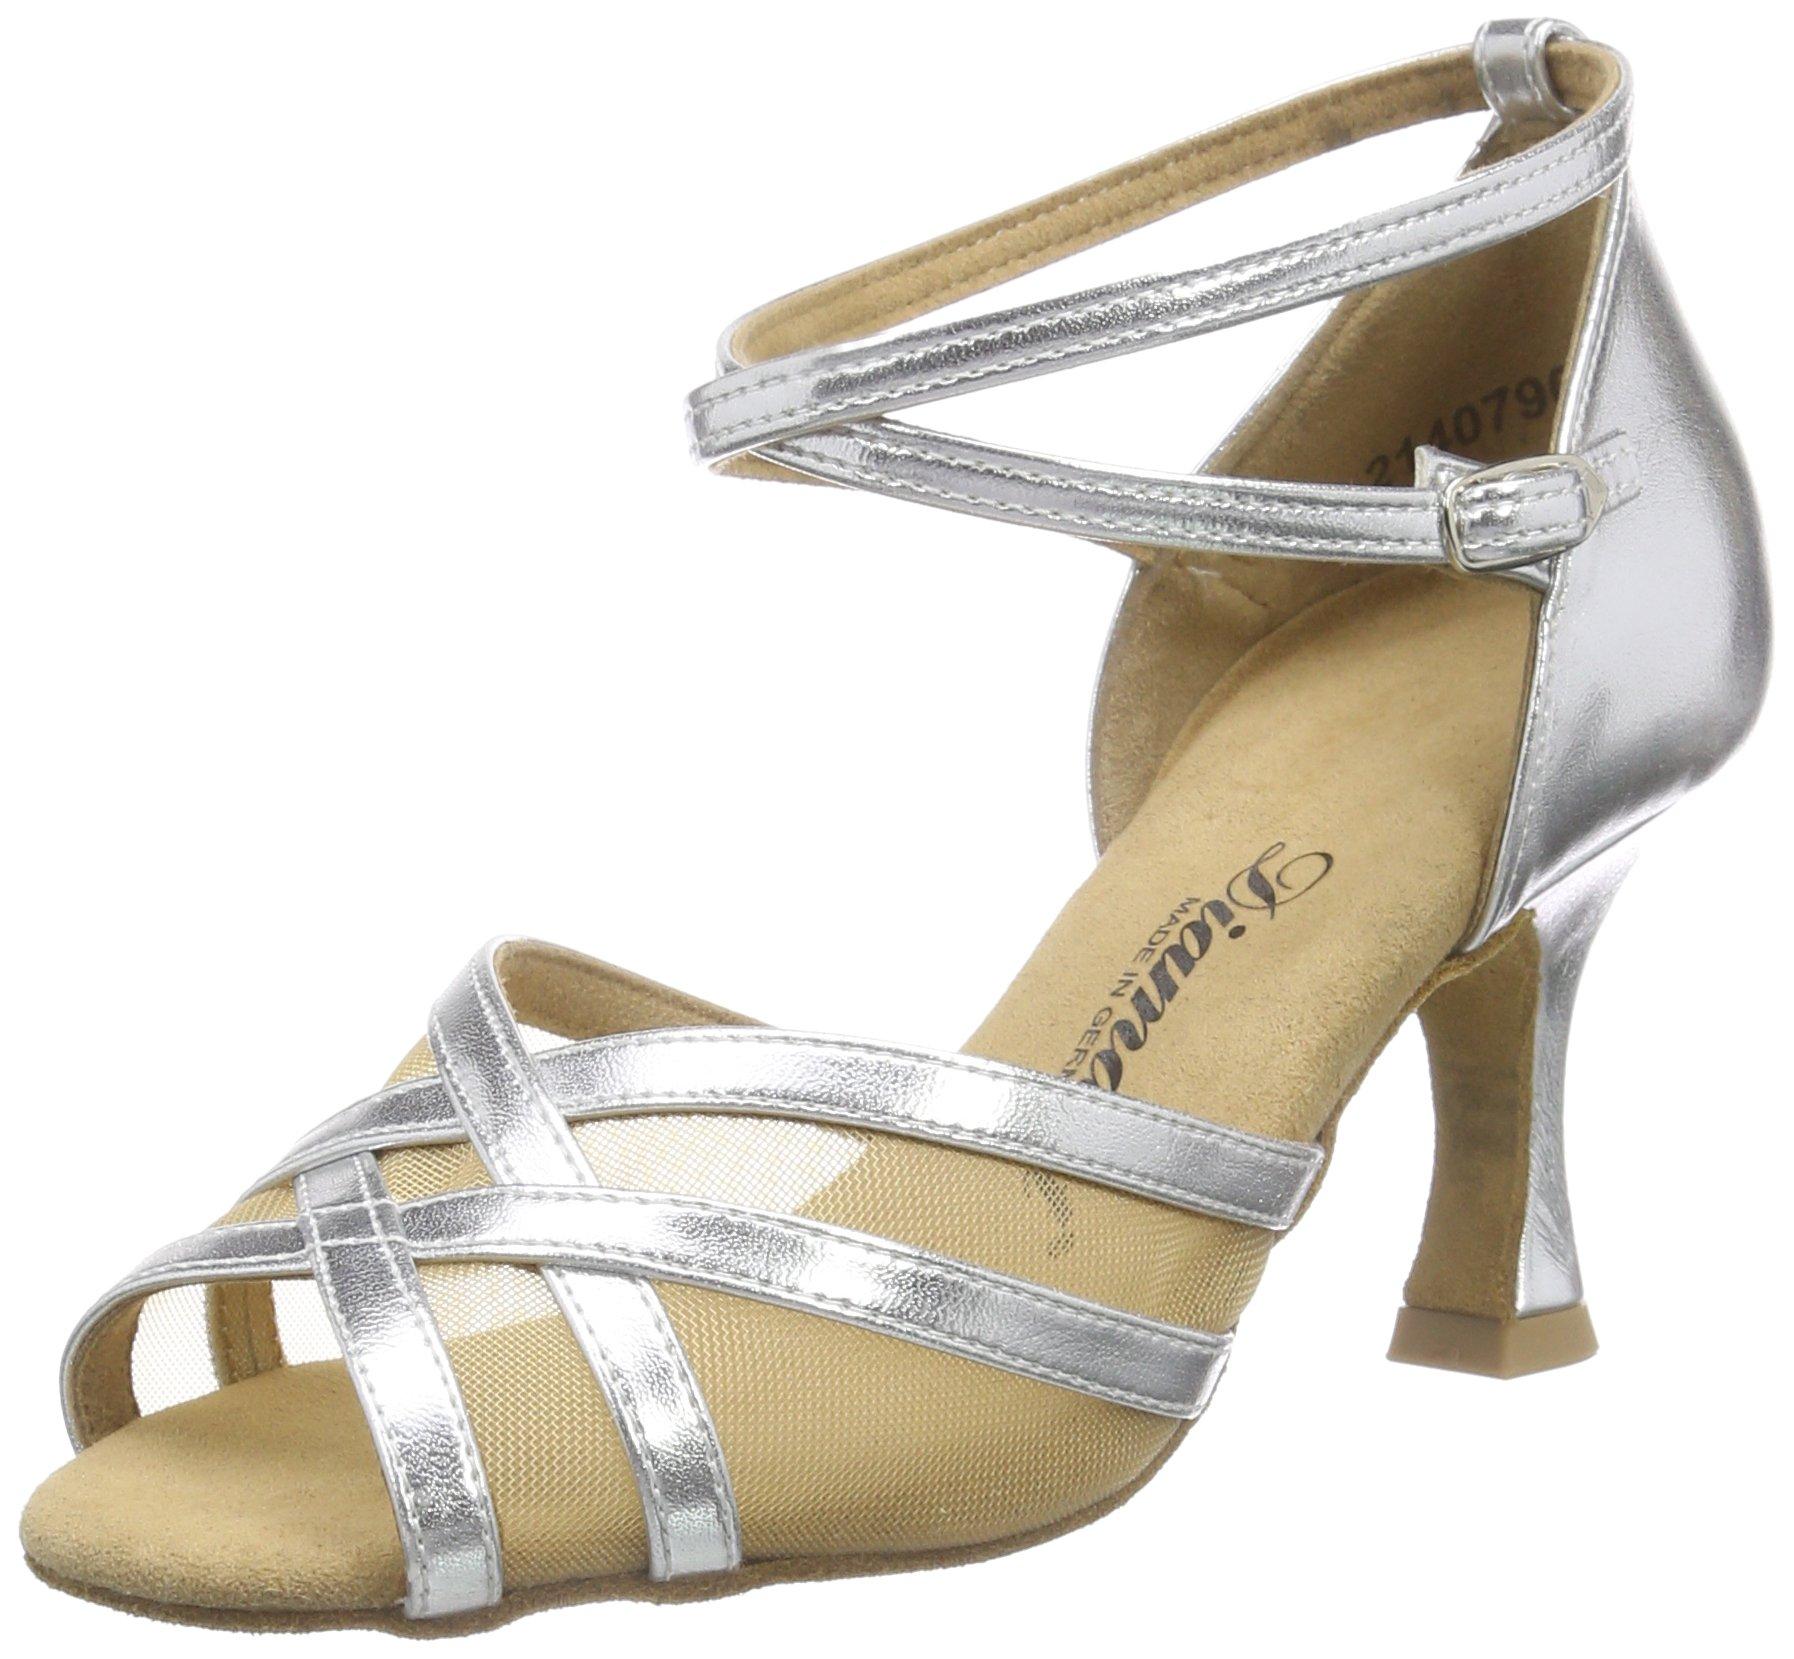 Femme 5 Argentsilber42 013Chaussures Eu8 Salon 035 Danse Diamant Uk Latein 2 3 Tanzschuhe De 087 Damen QCxdtsrh